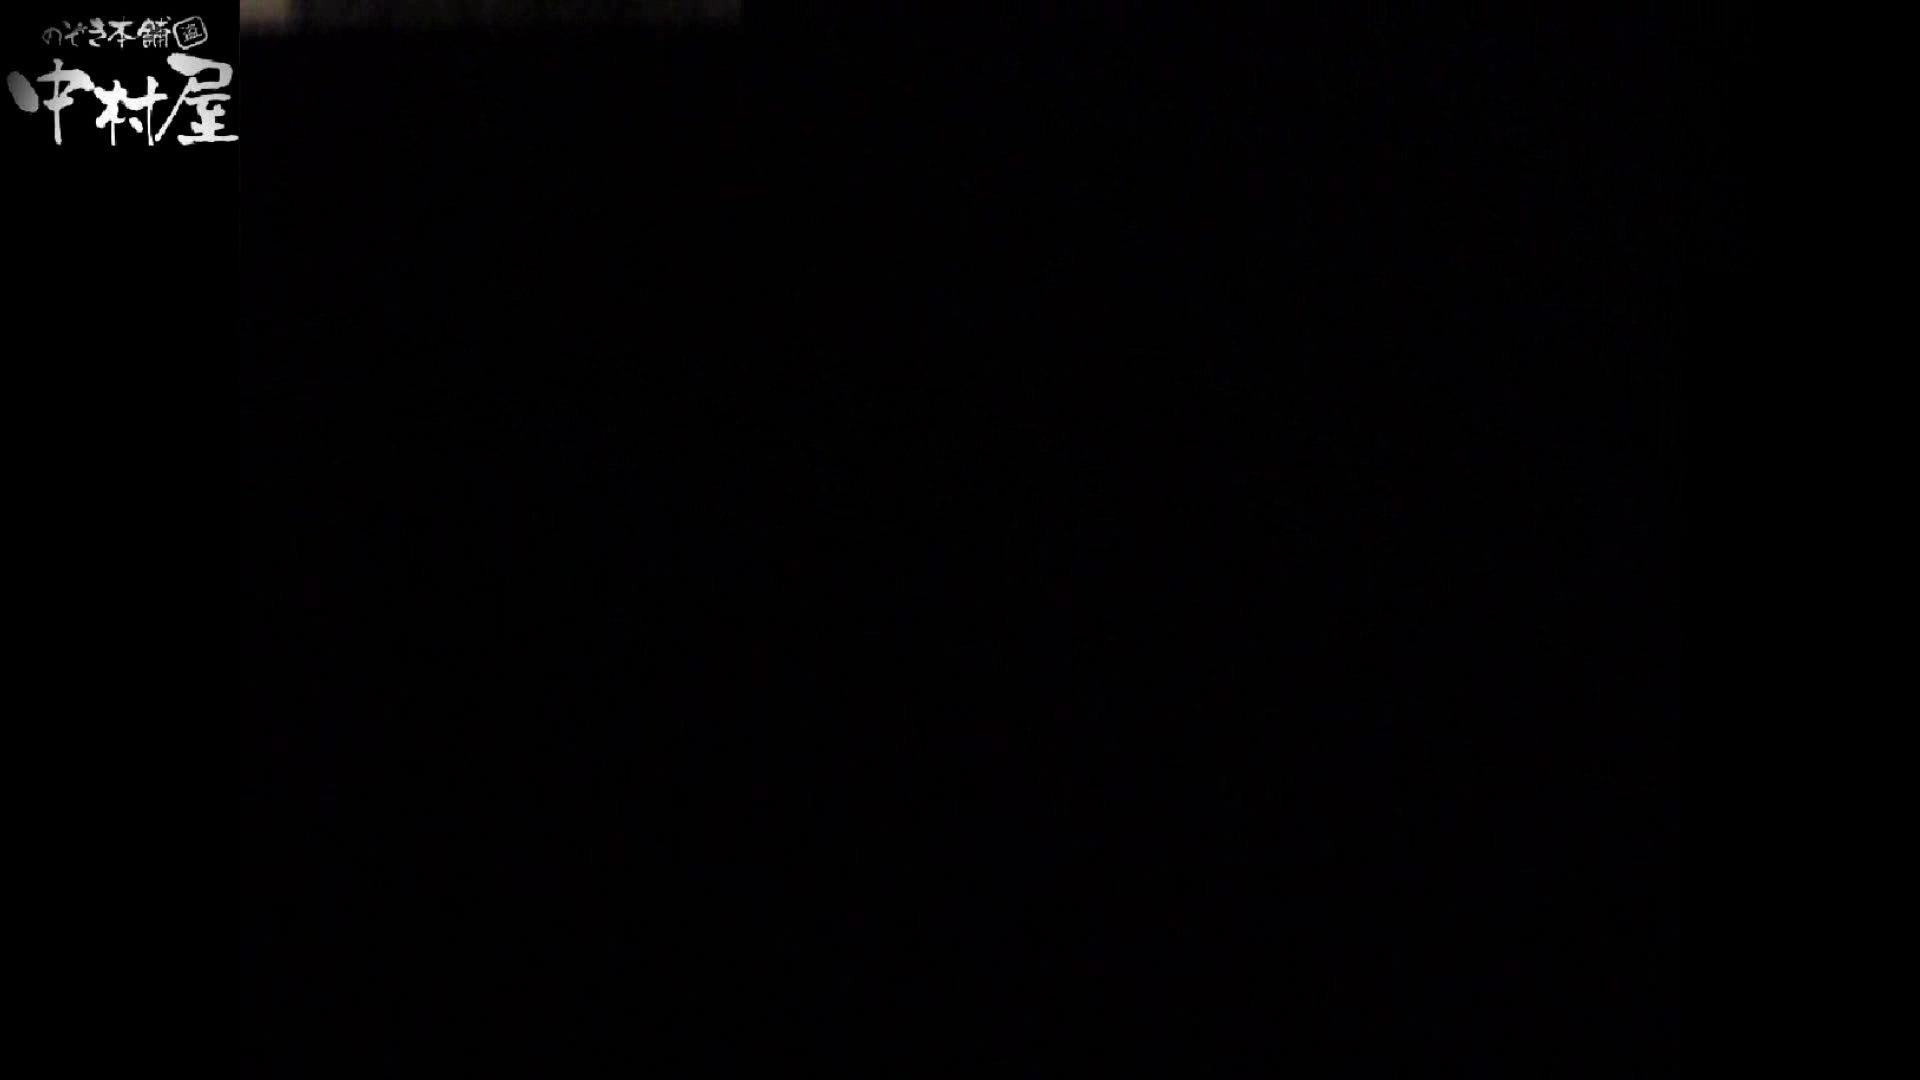 民家風呂専門盗撮師の超危険映像 vol.023 OLのエロ生活 性交動画流出 95連発 92